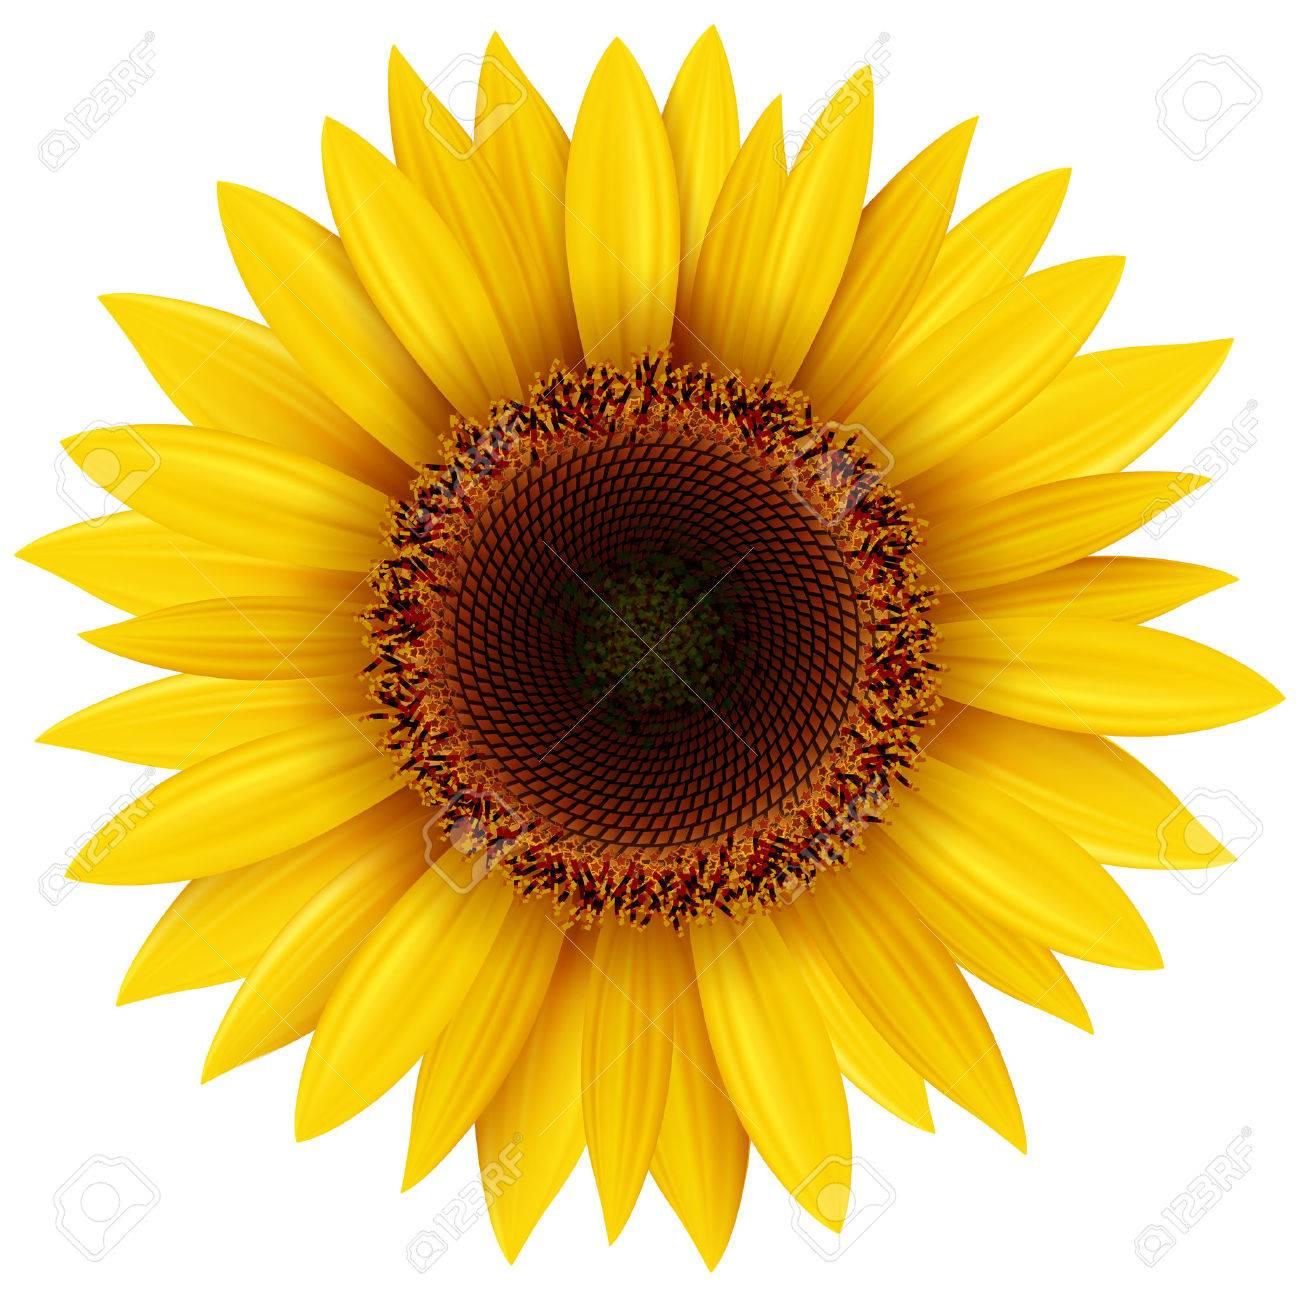 Sunflower isolated, illustration. - 46956103